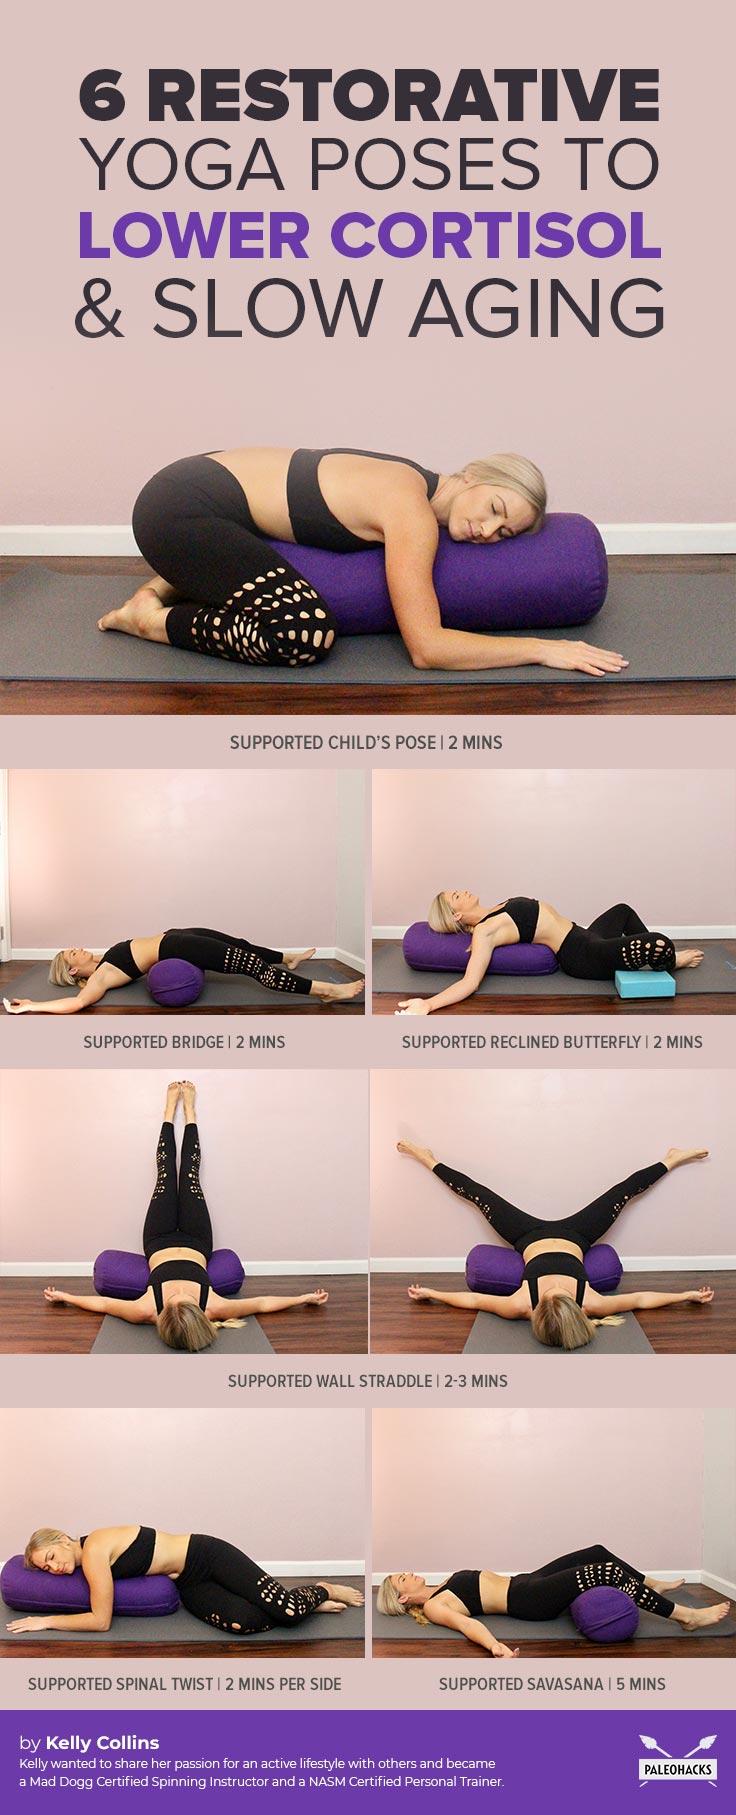 900 Ideas De Yoga En 2021 Yoga Posturas De Yoga Fotos Yoga